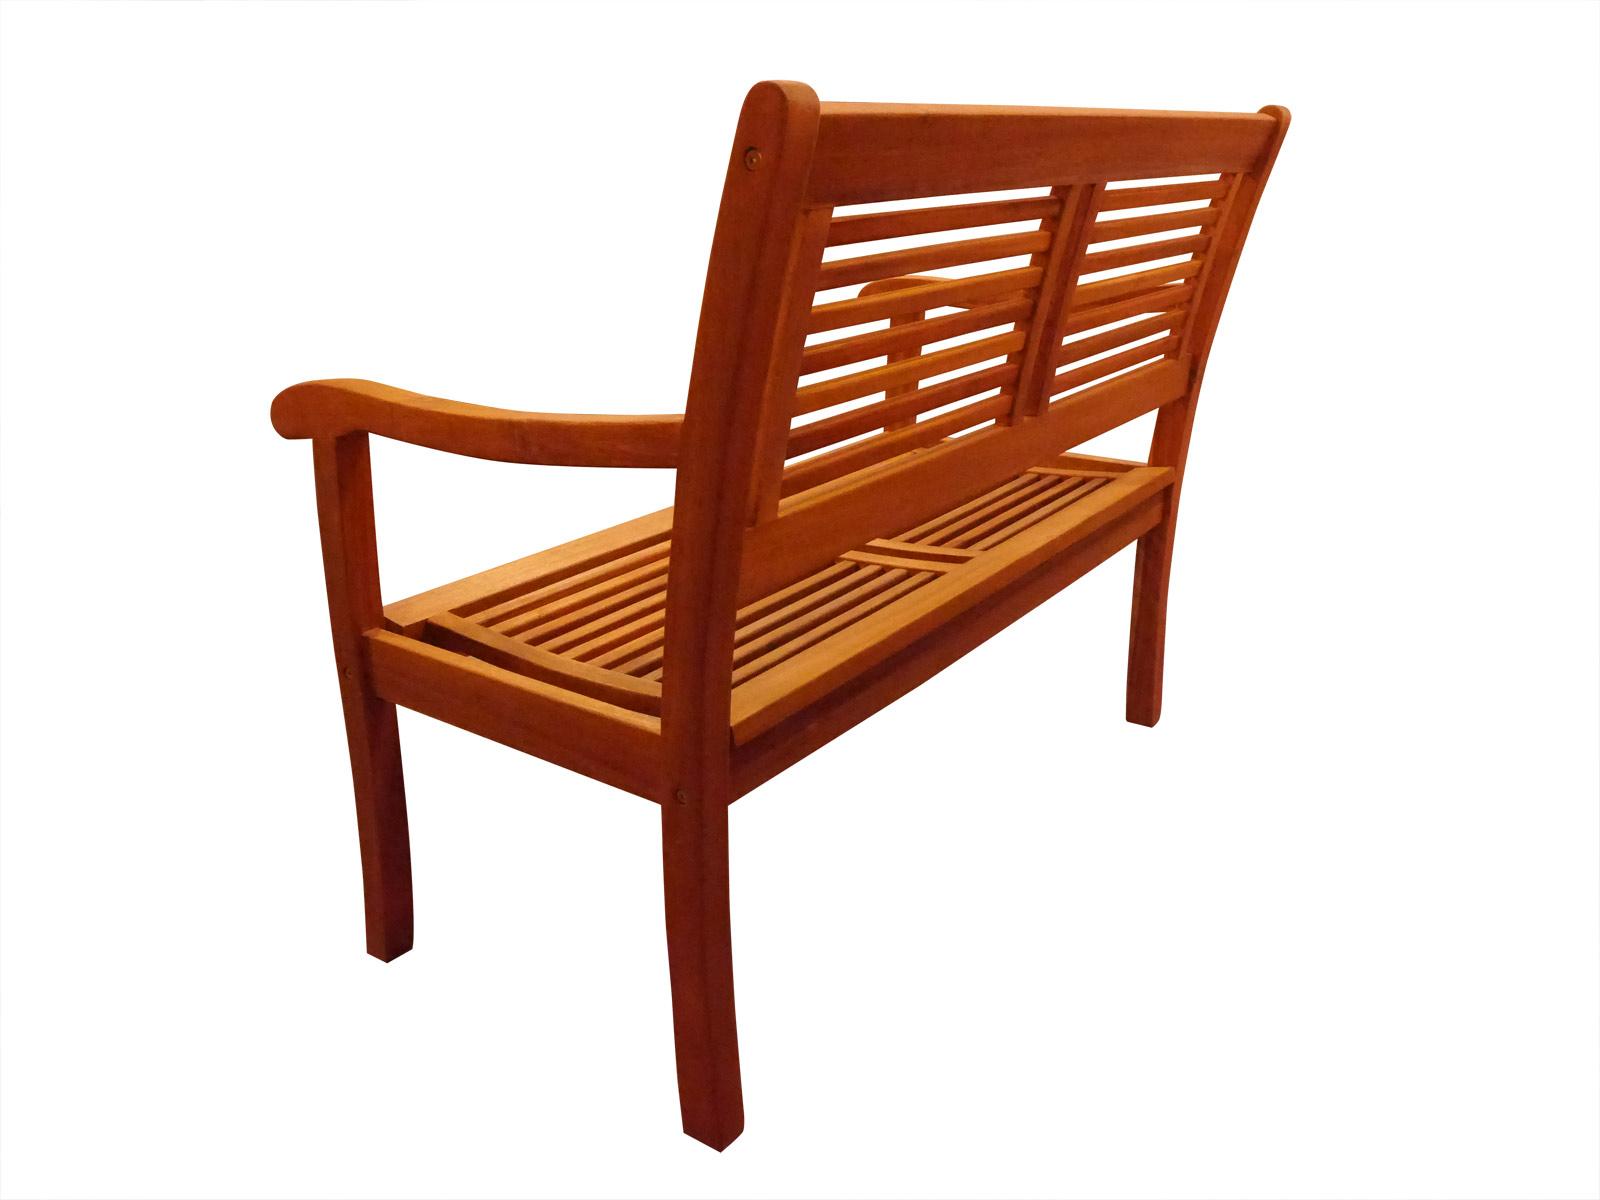 Gartenbank Akazie 110 Cm 2 Sitzer Sitzbank Cordoba Ebay